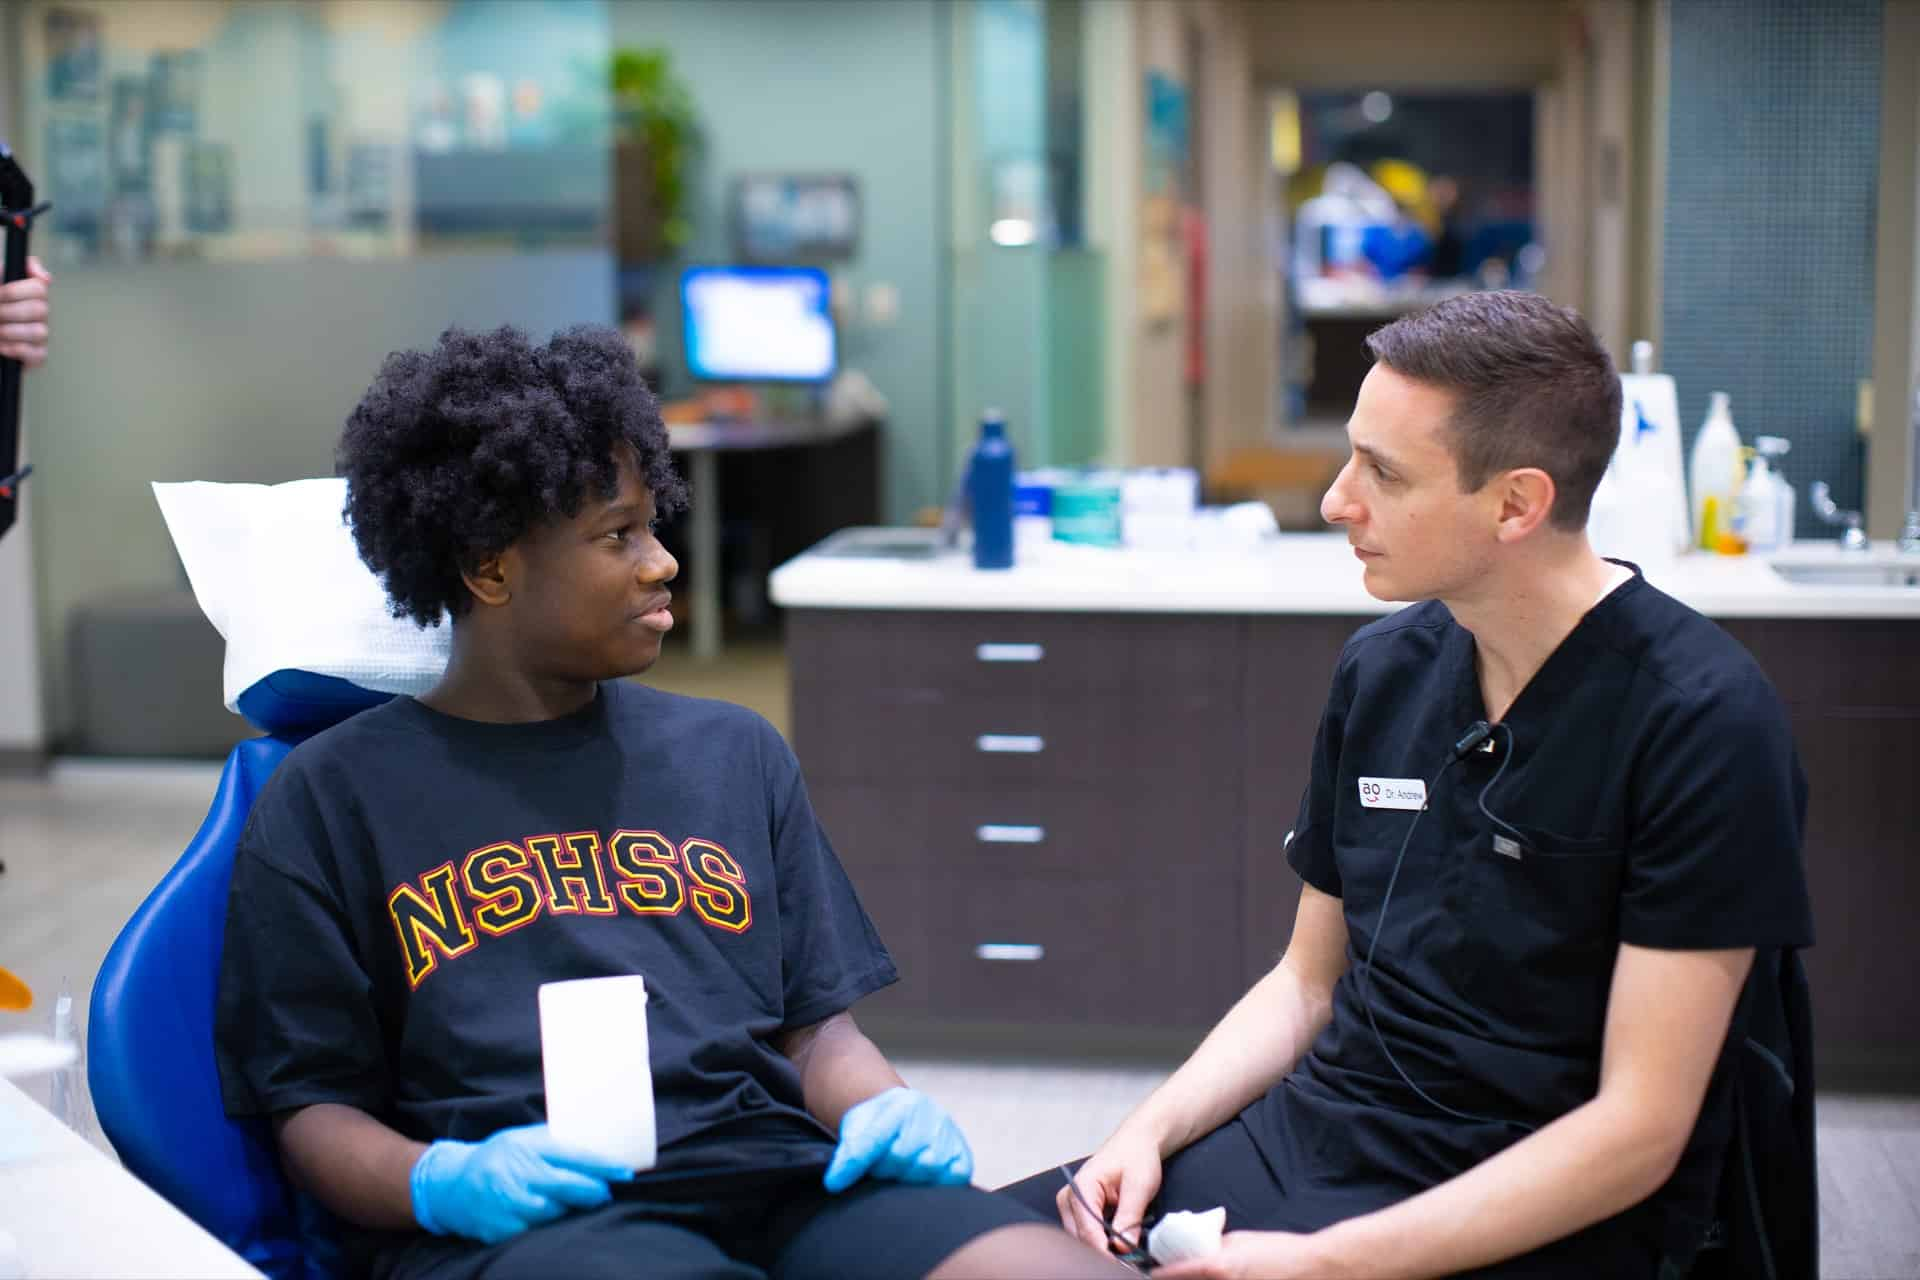 Appel Orthodontics Philadelphia Orthodontist Staff Candids 111 - The Appel Orthodontics Blog